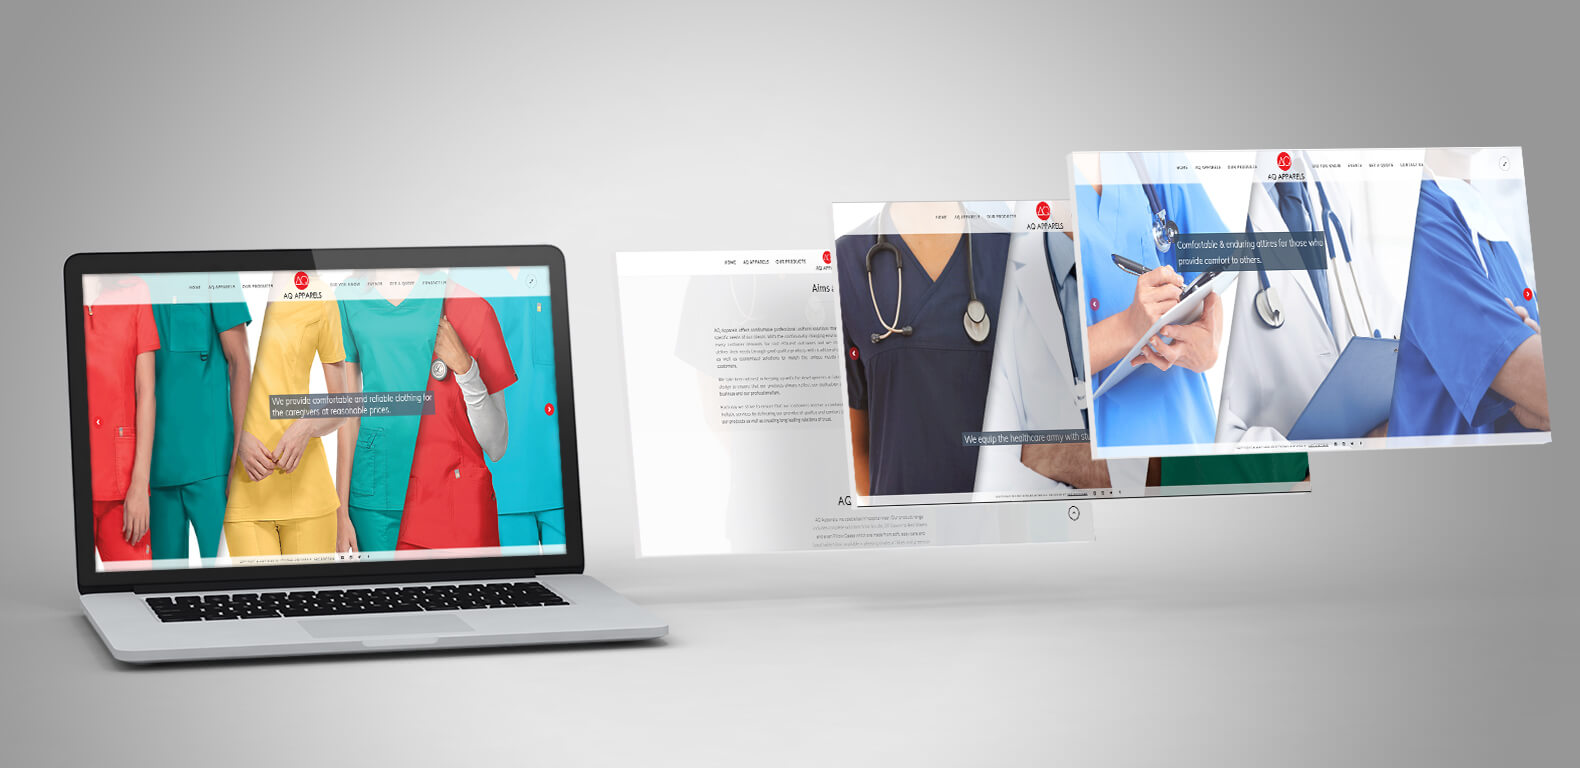 Website-Design-Development-1580x768-AQ-Apparels